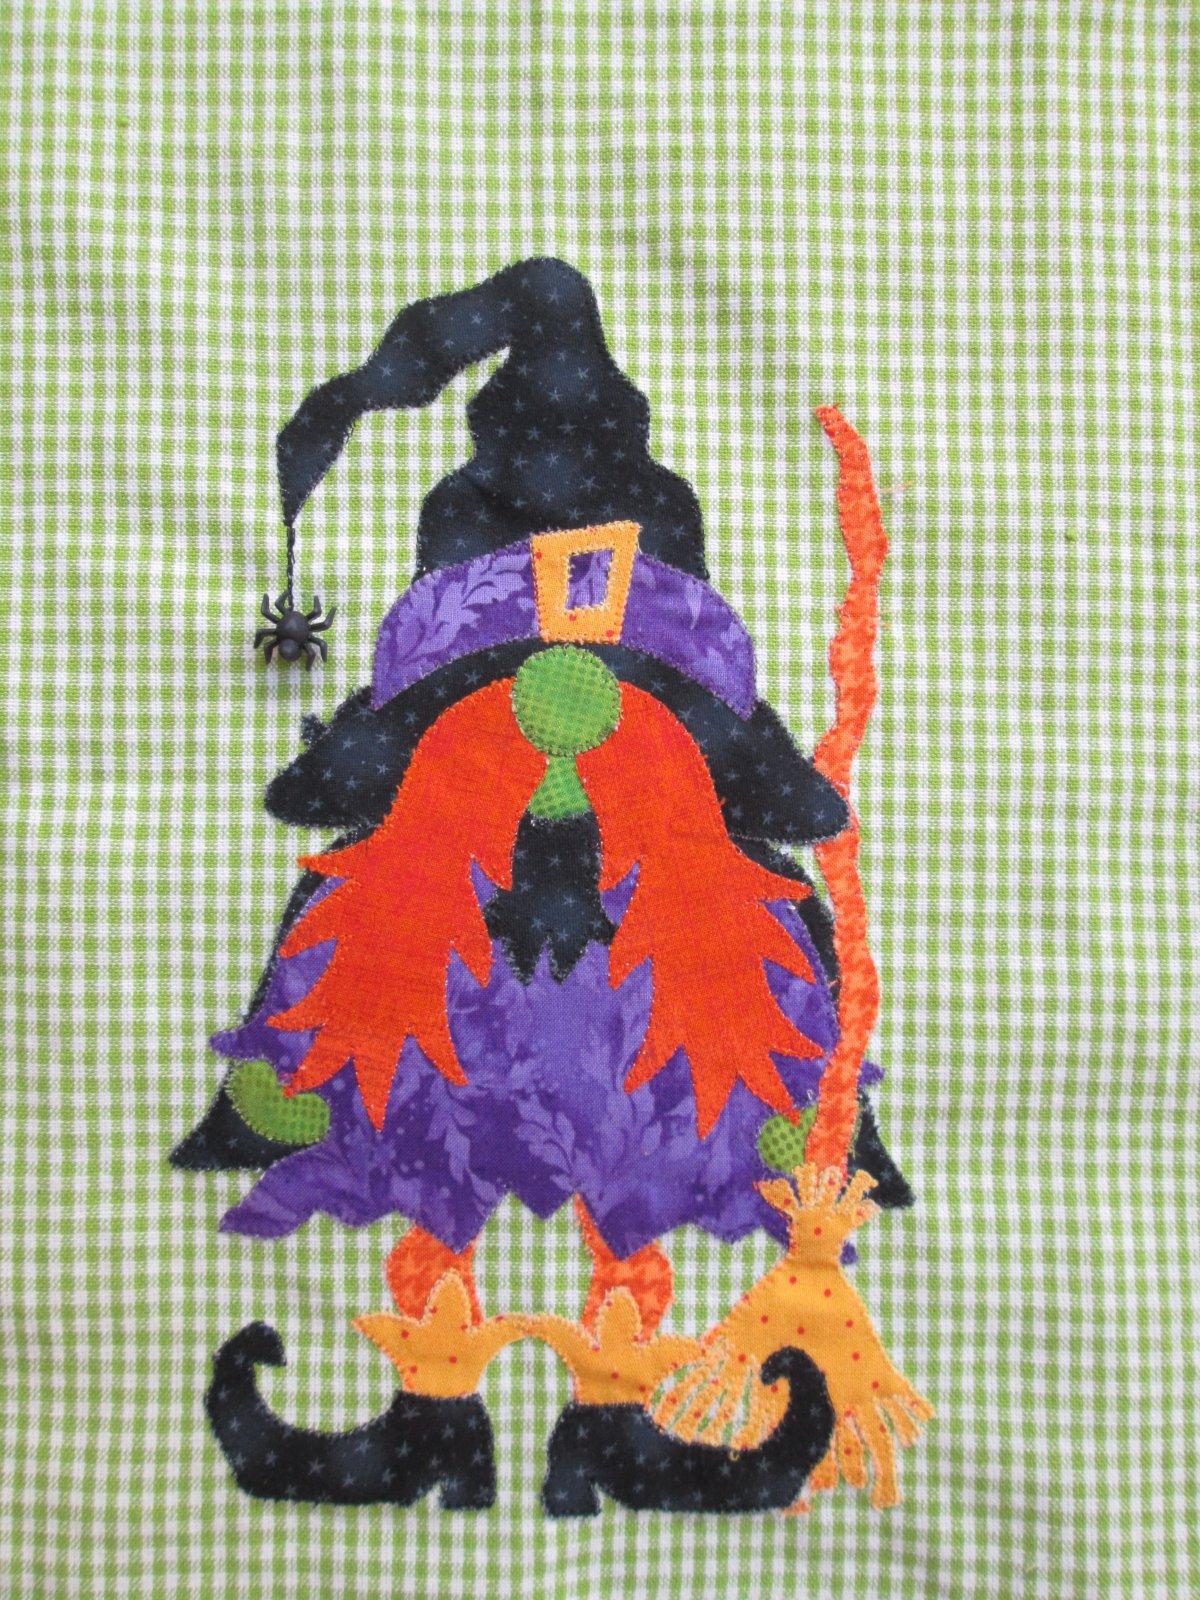 Wanda the Witch Gnome Tea Towel Kit (Autumn Gnomes Pattern)